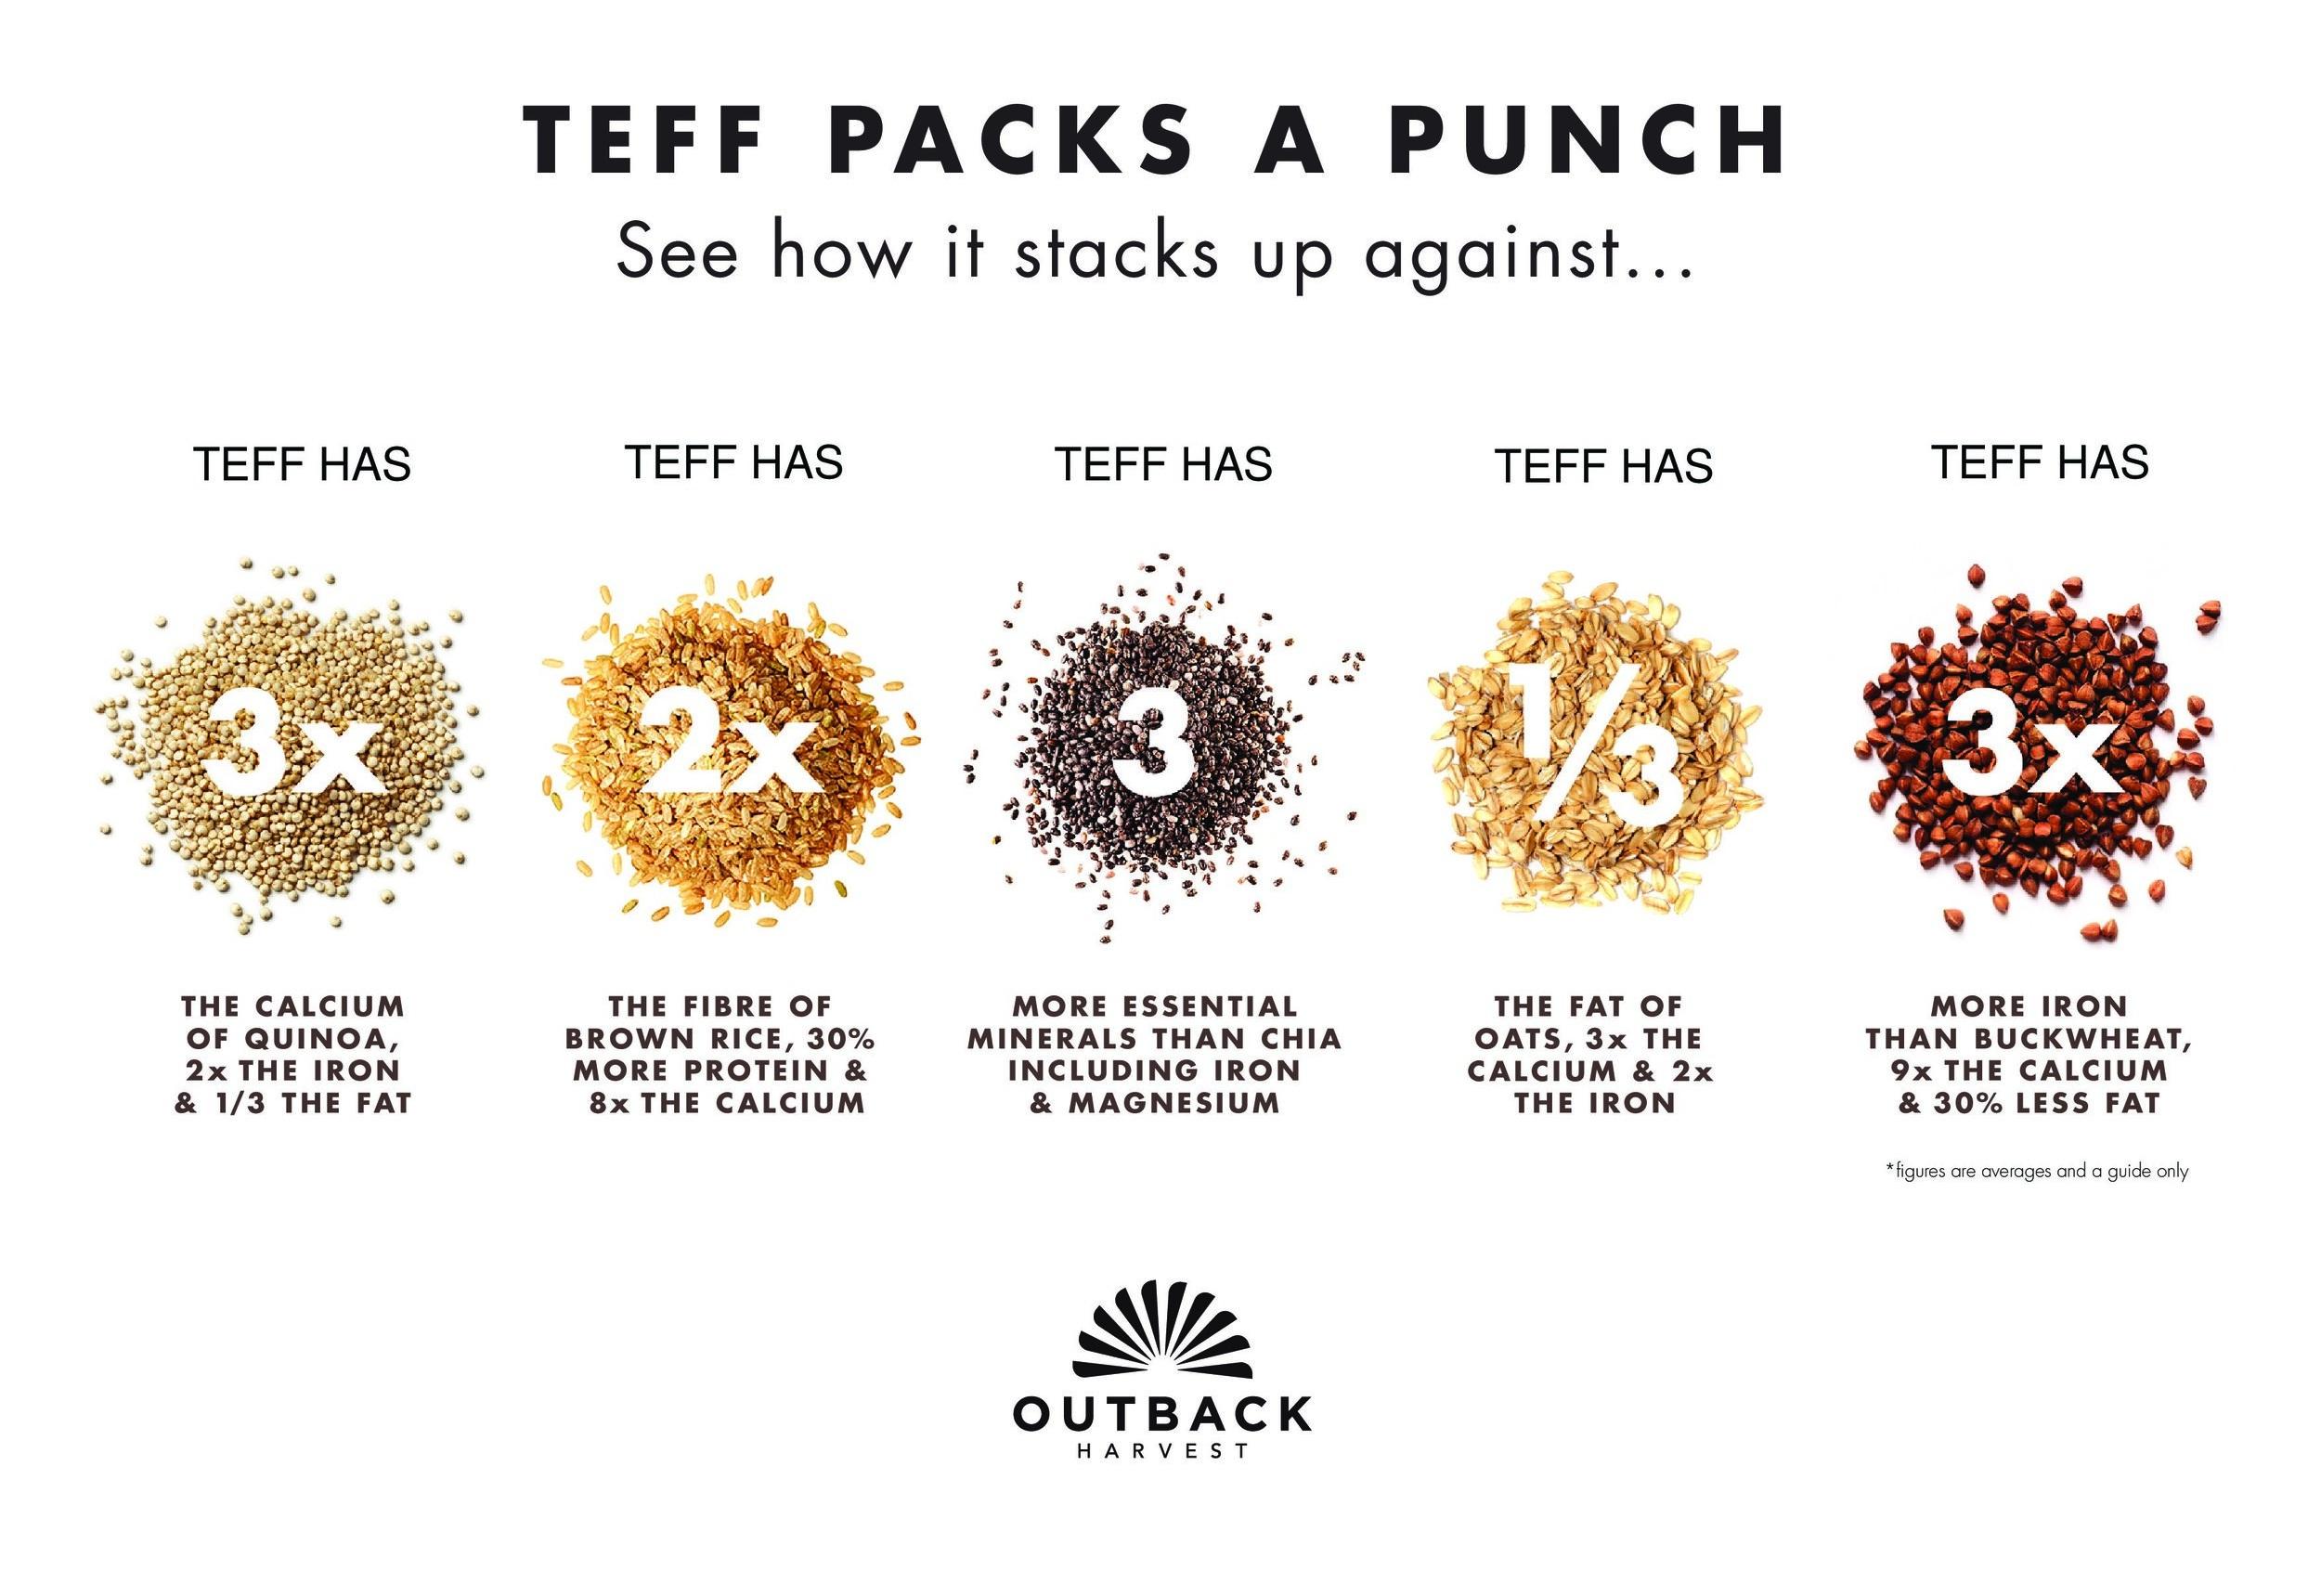 Teff+Comparison+Image.jpg